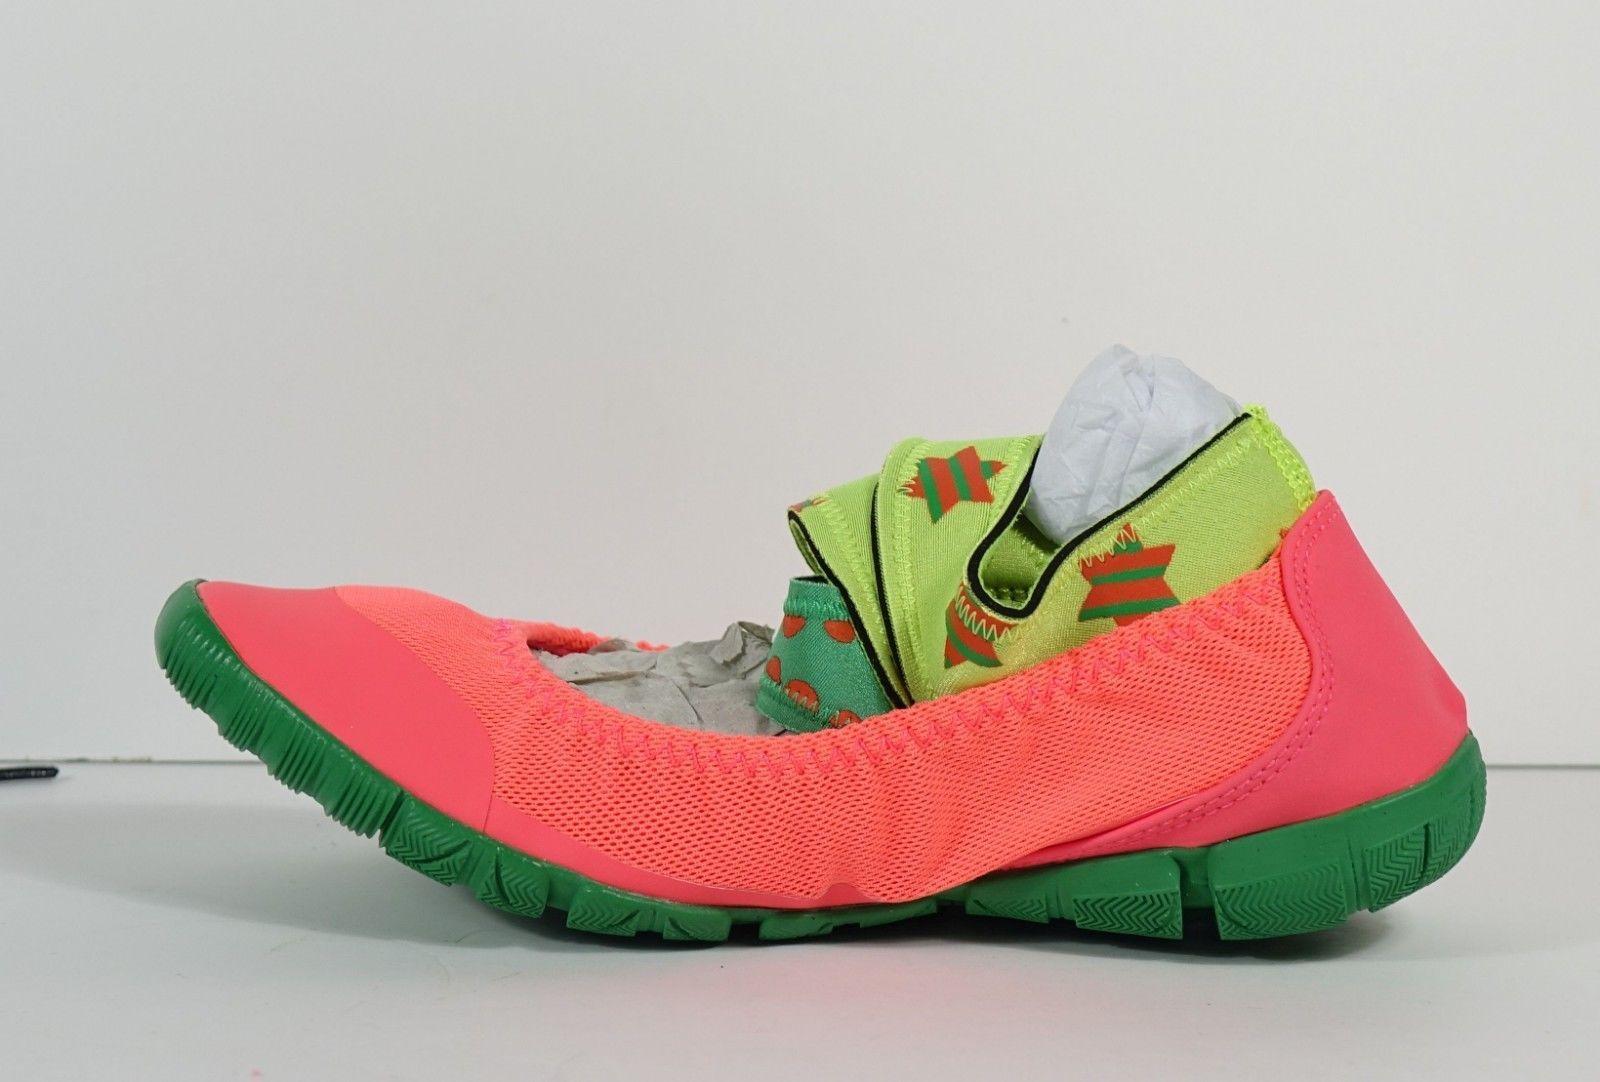 Nike Studio Wrap Pack NRG Punch Green Yoga and 50 similar items